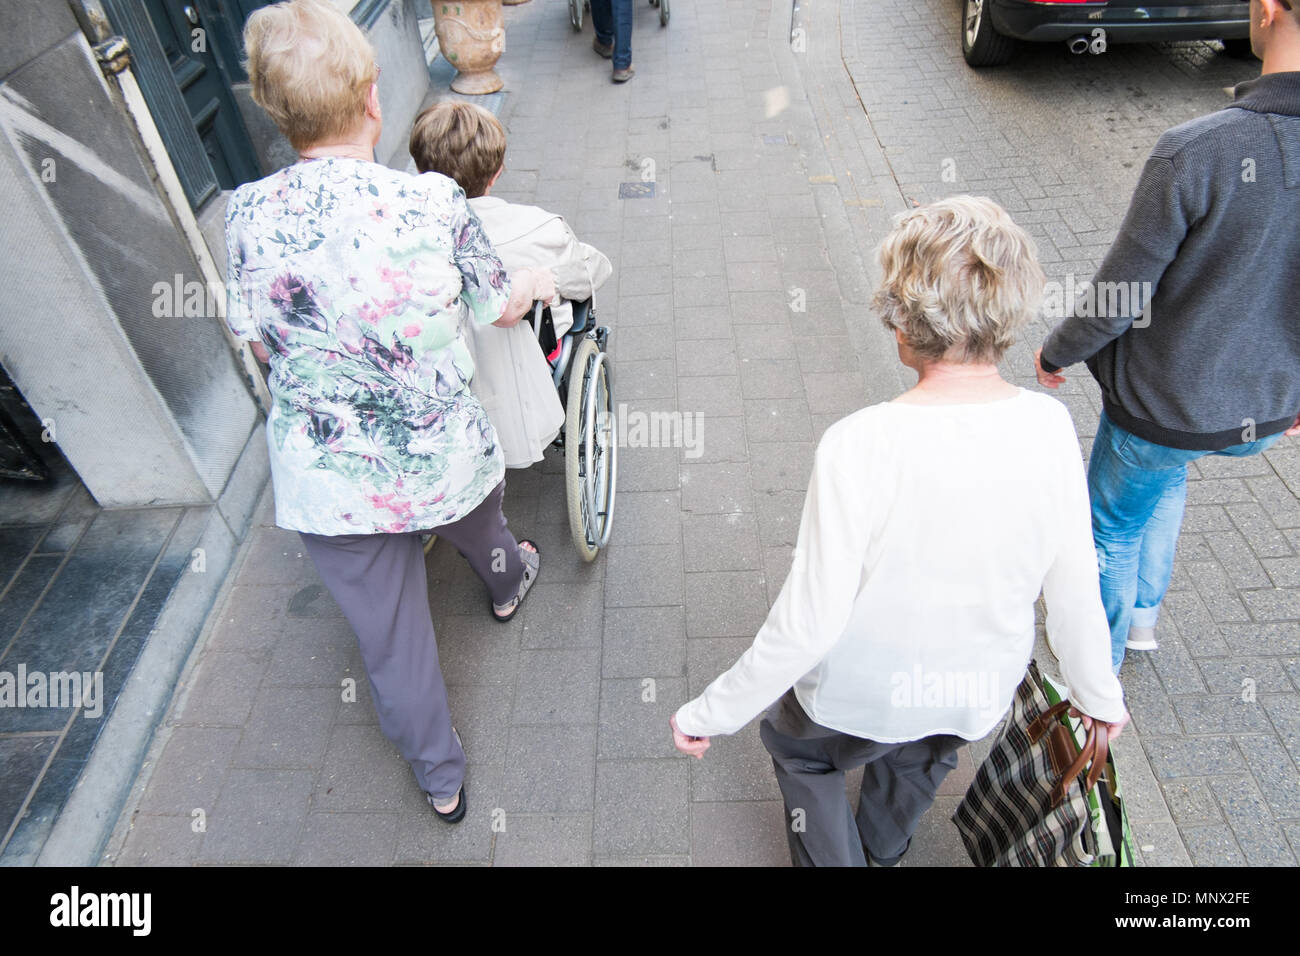 Old women pushing another women in a wheel chair, antwerp, belgium Stock Photo